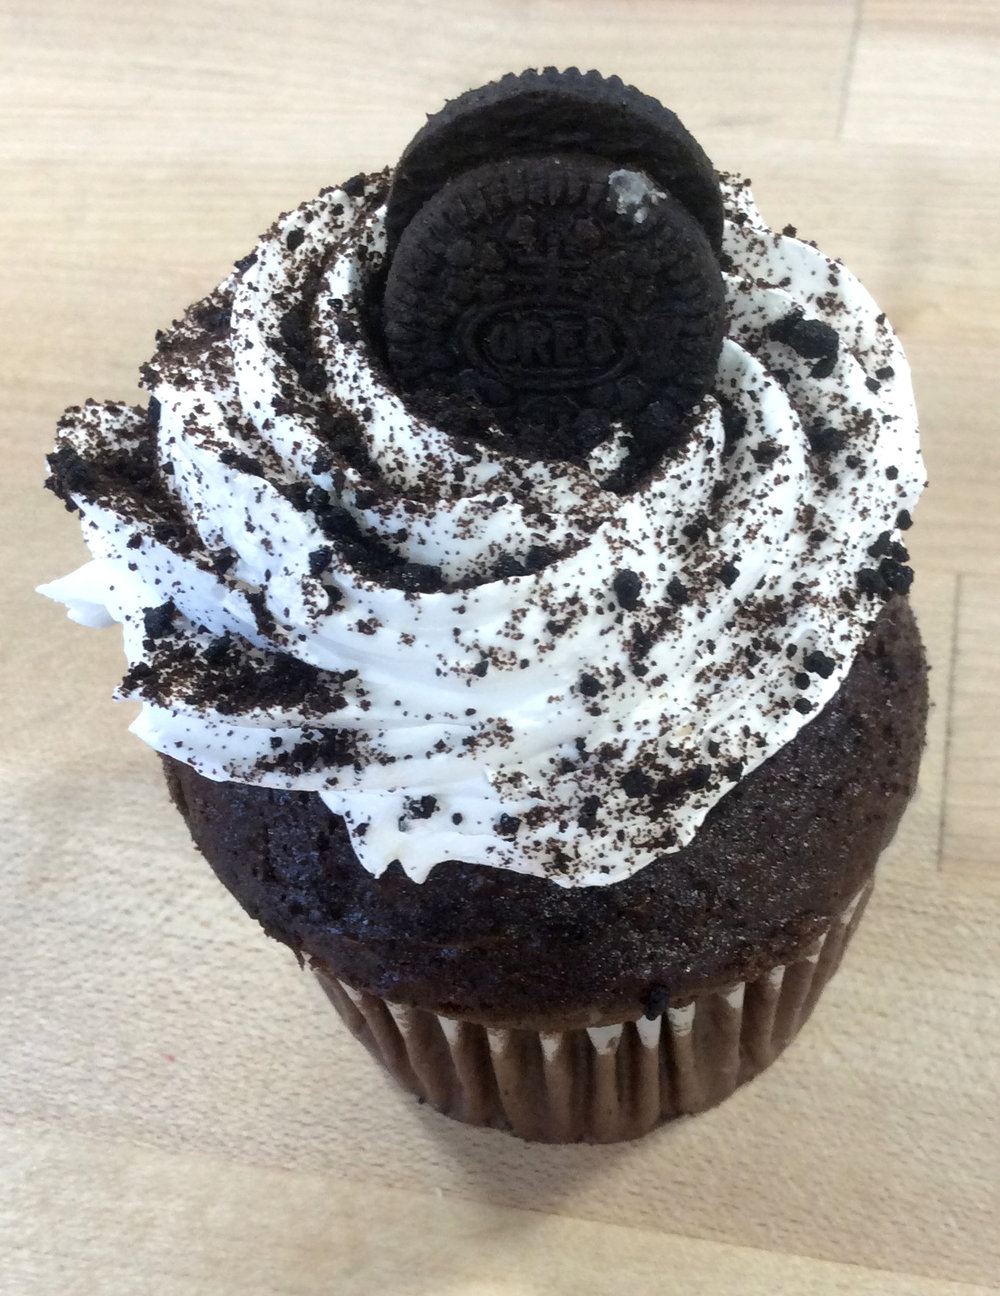 Oreo Dessert Cupcakes